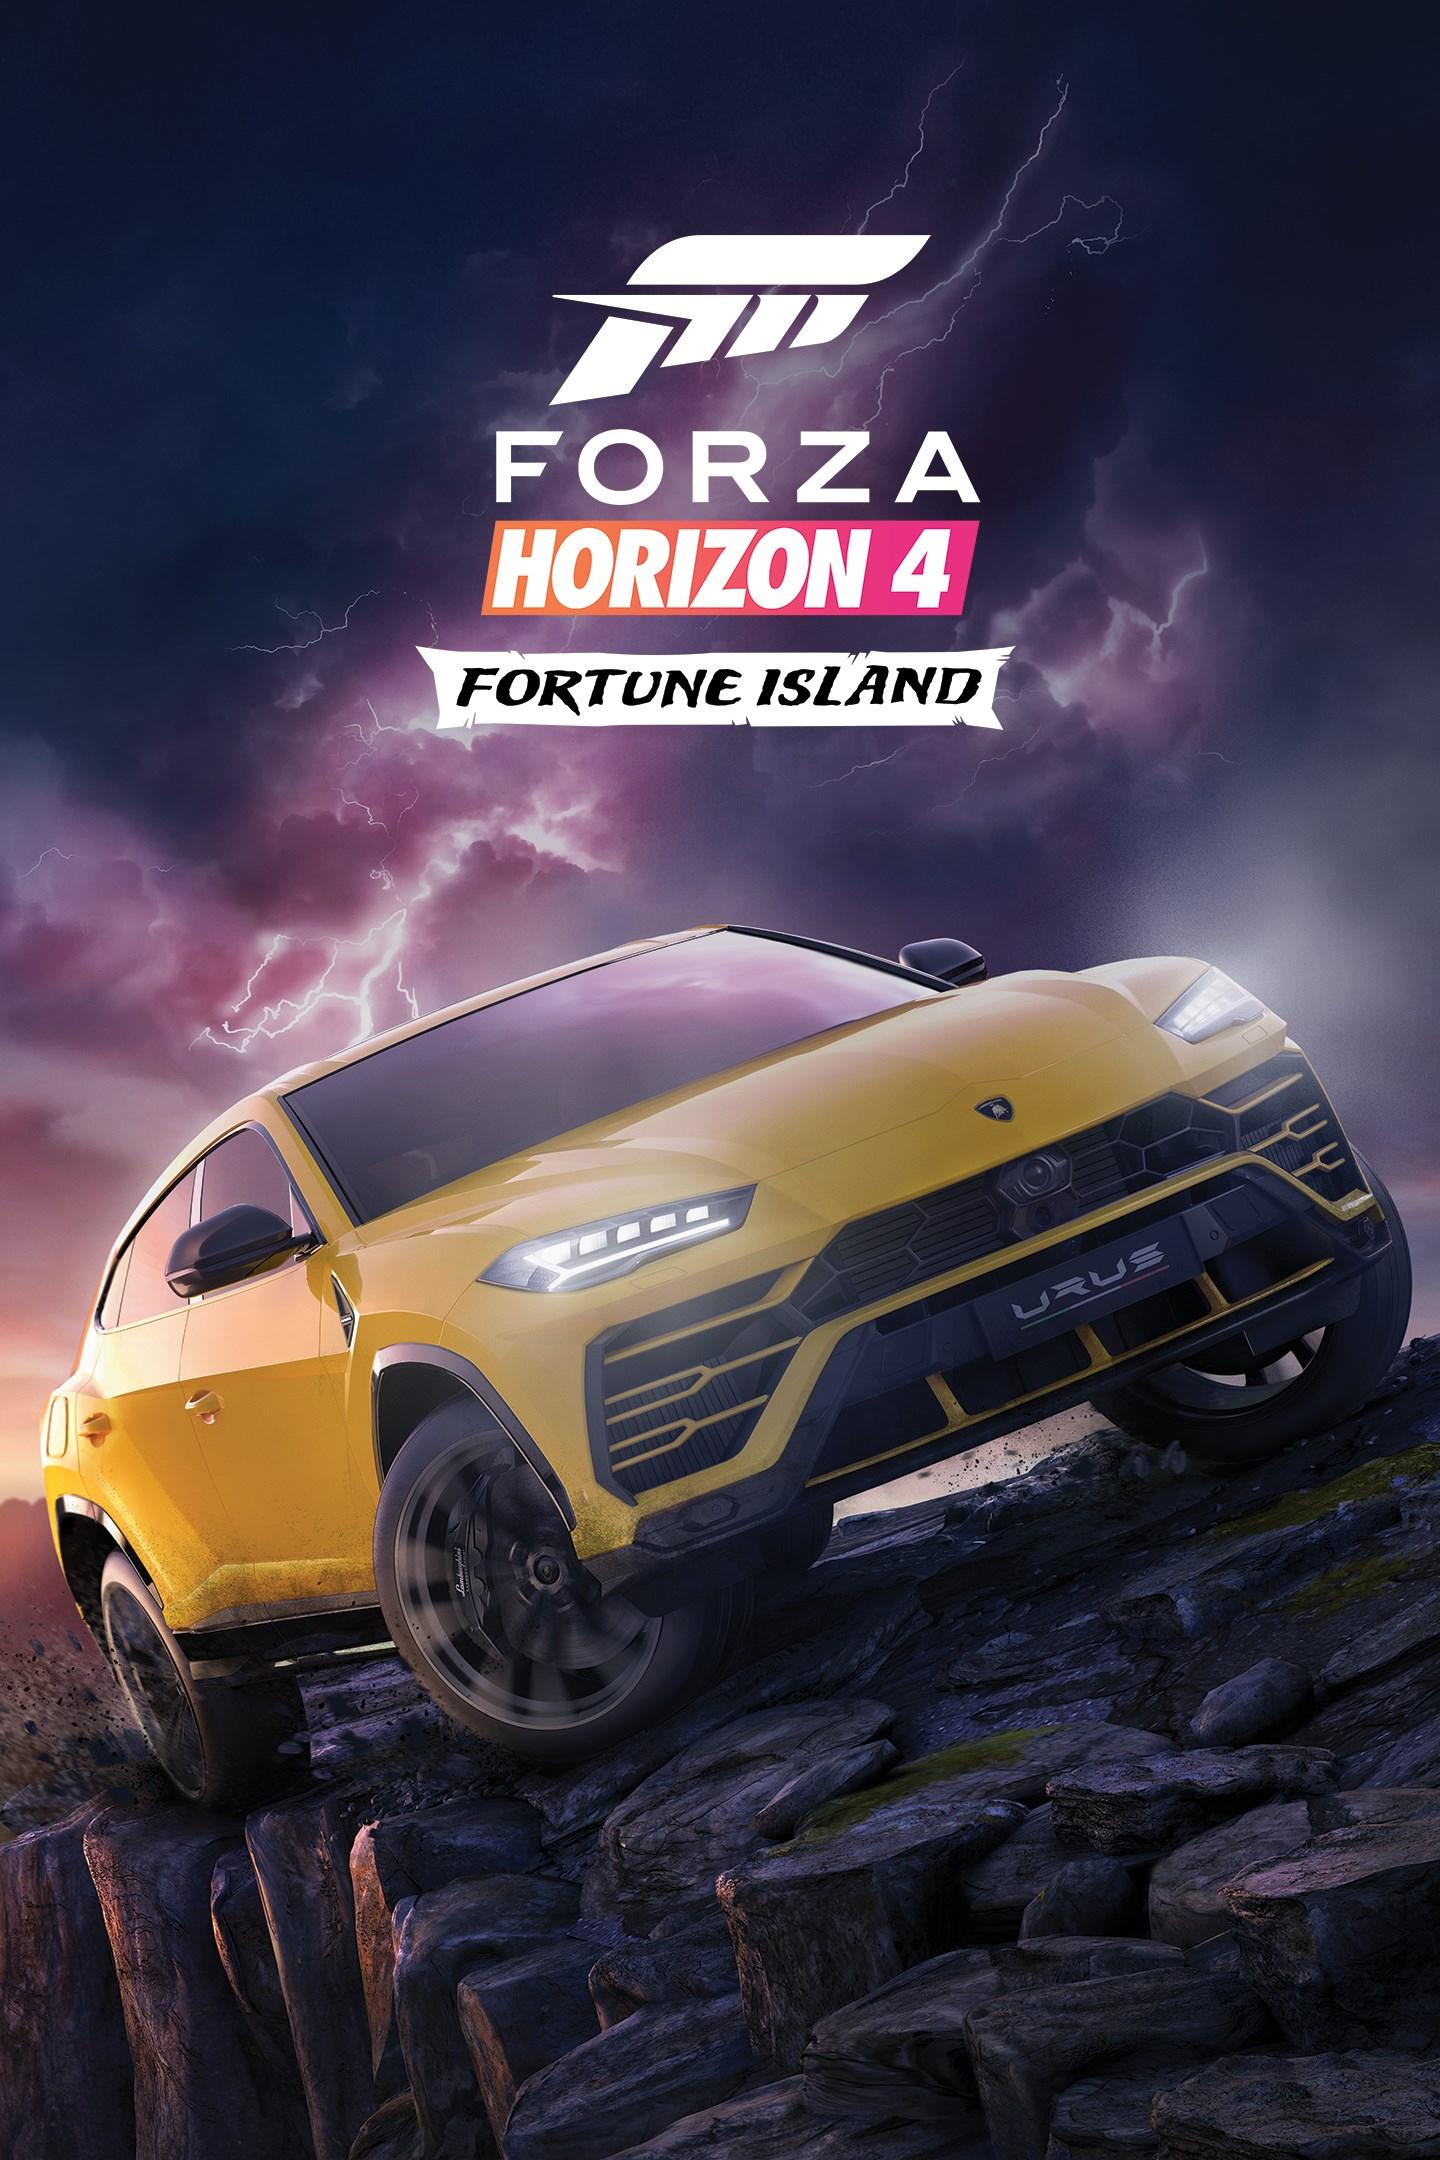 Forza Horizon 4: Fortune Island (PC) MS Store